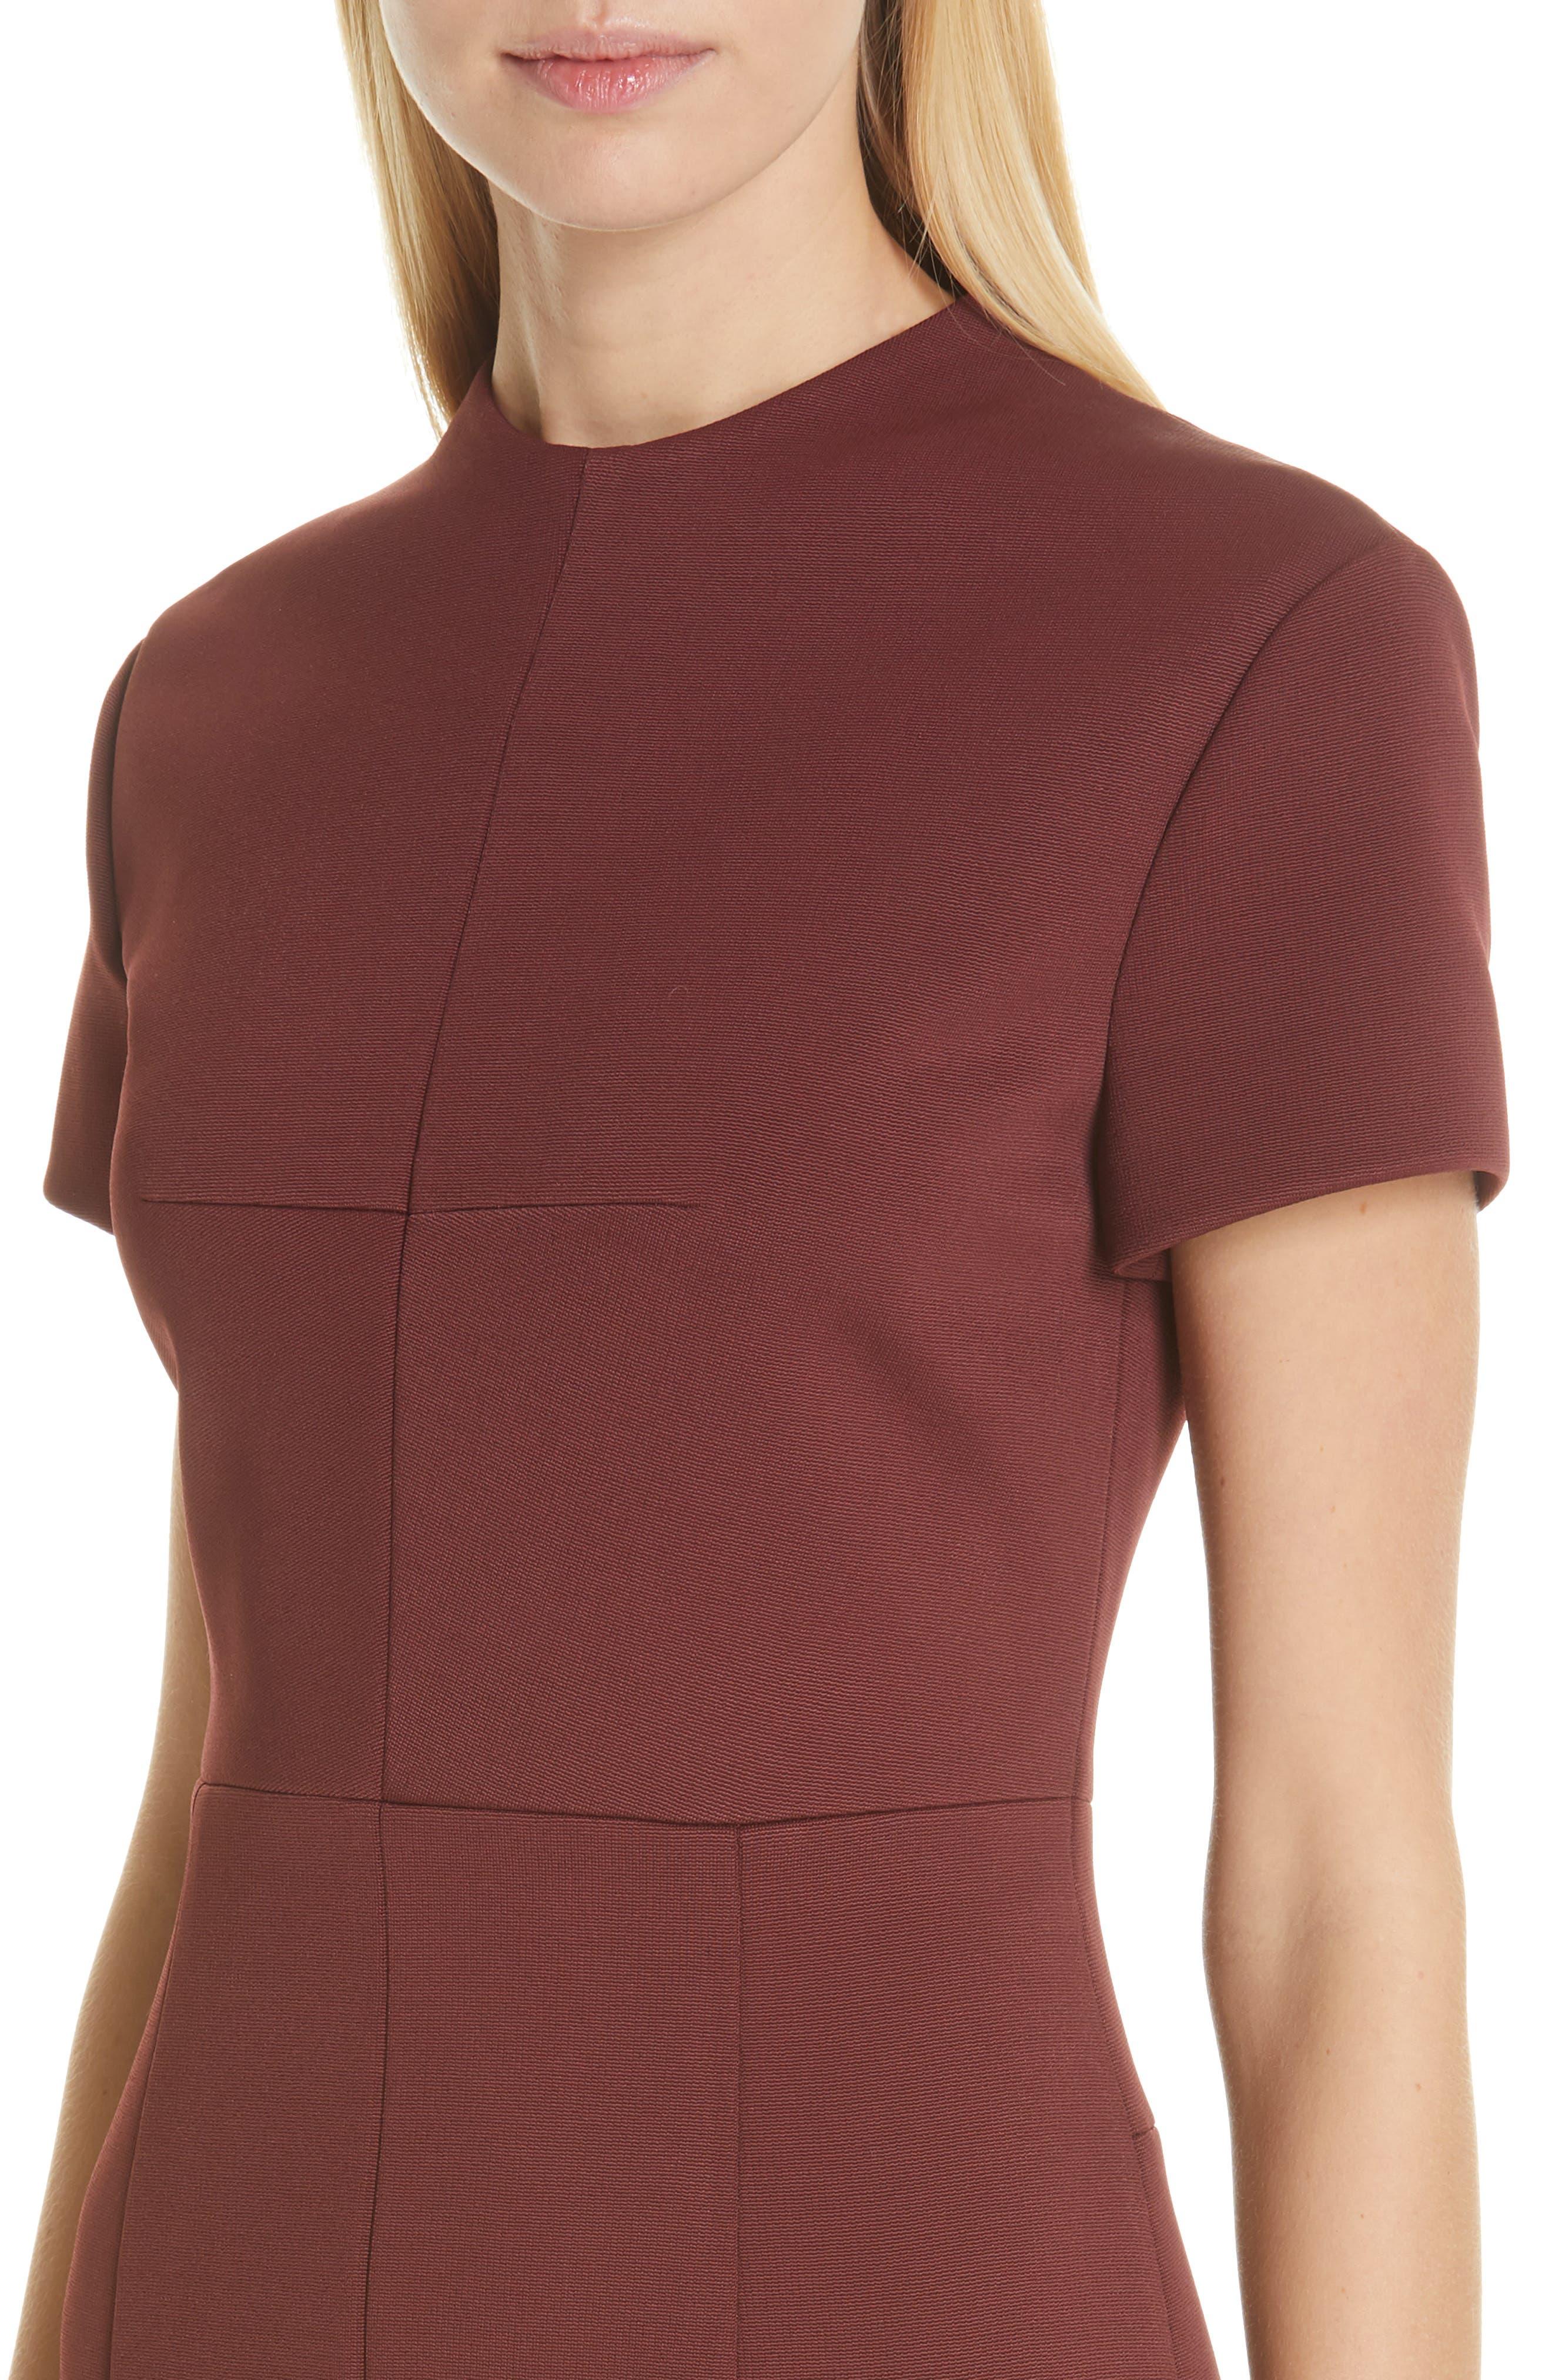 Demiara Sheath Dress,                             Alternate thumbnail 4, color,                             DARK AUBURN